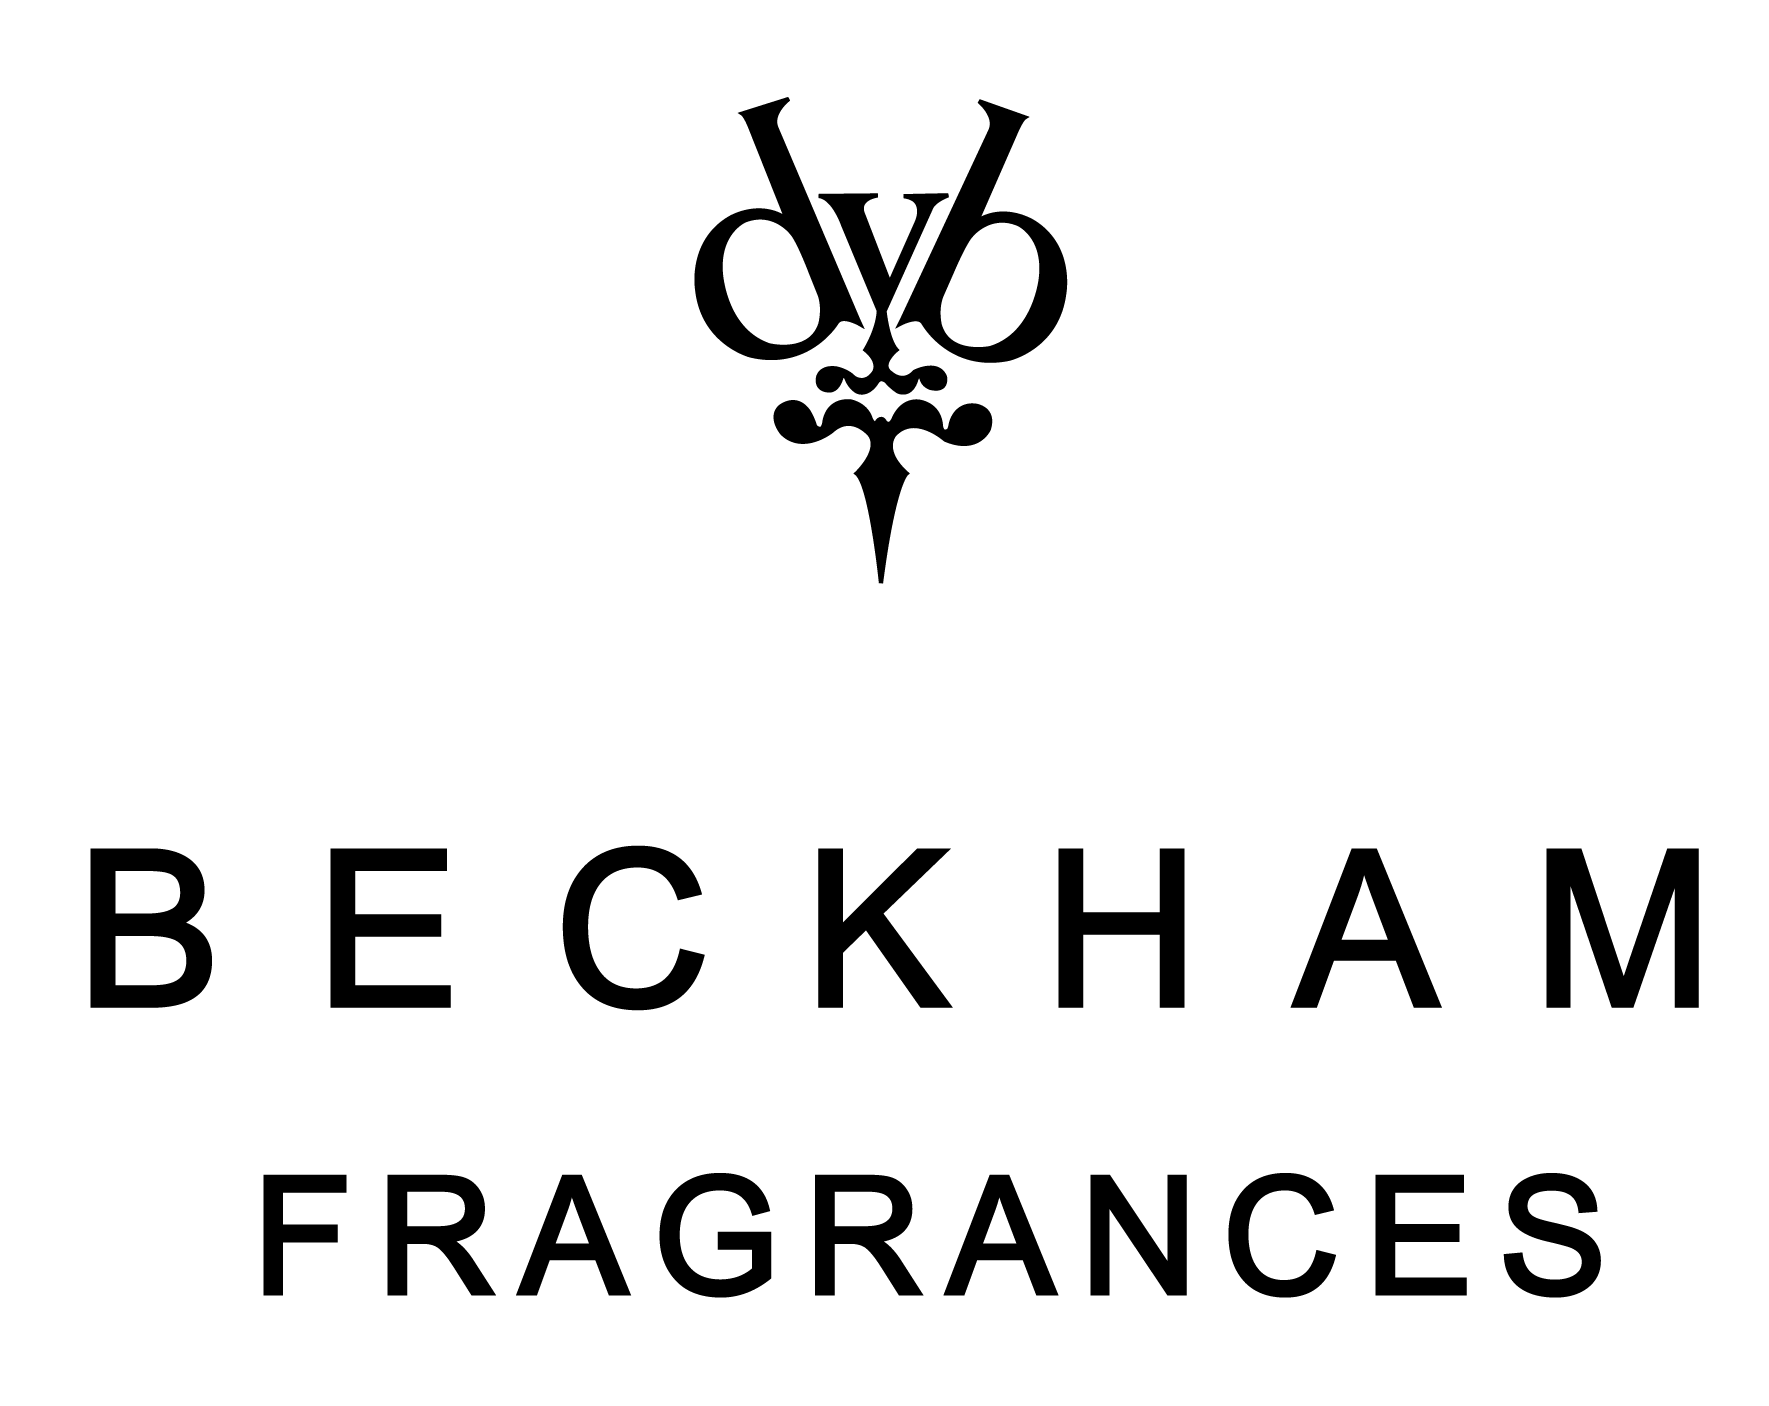 David victoria beckham Logos